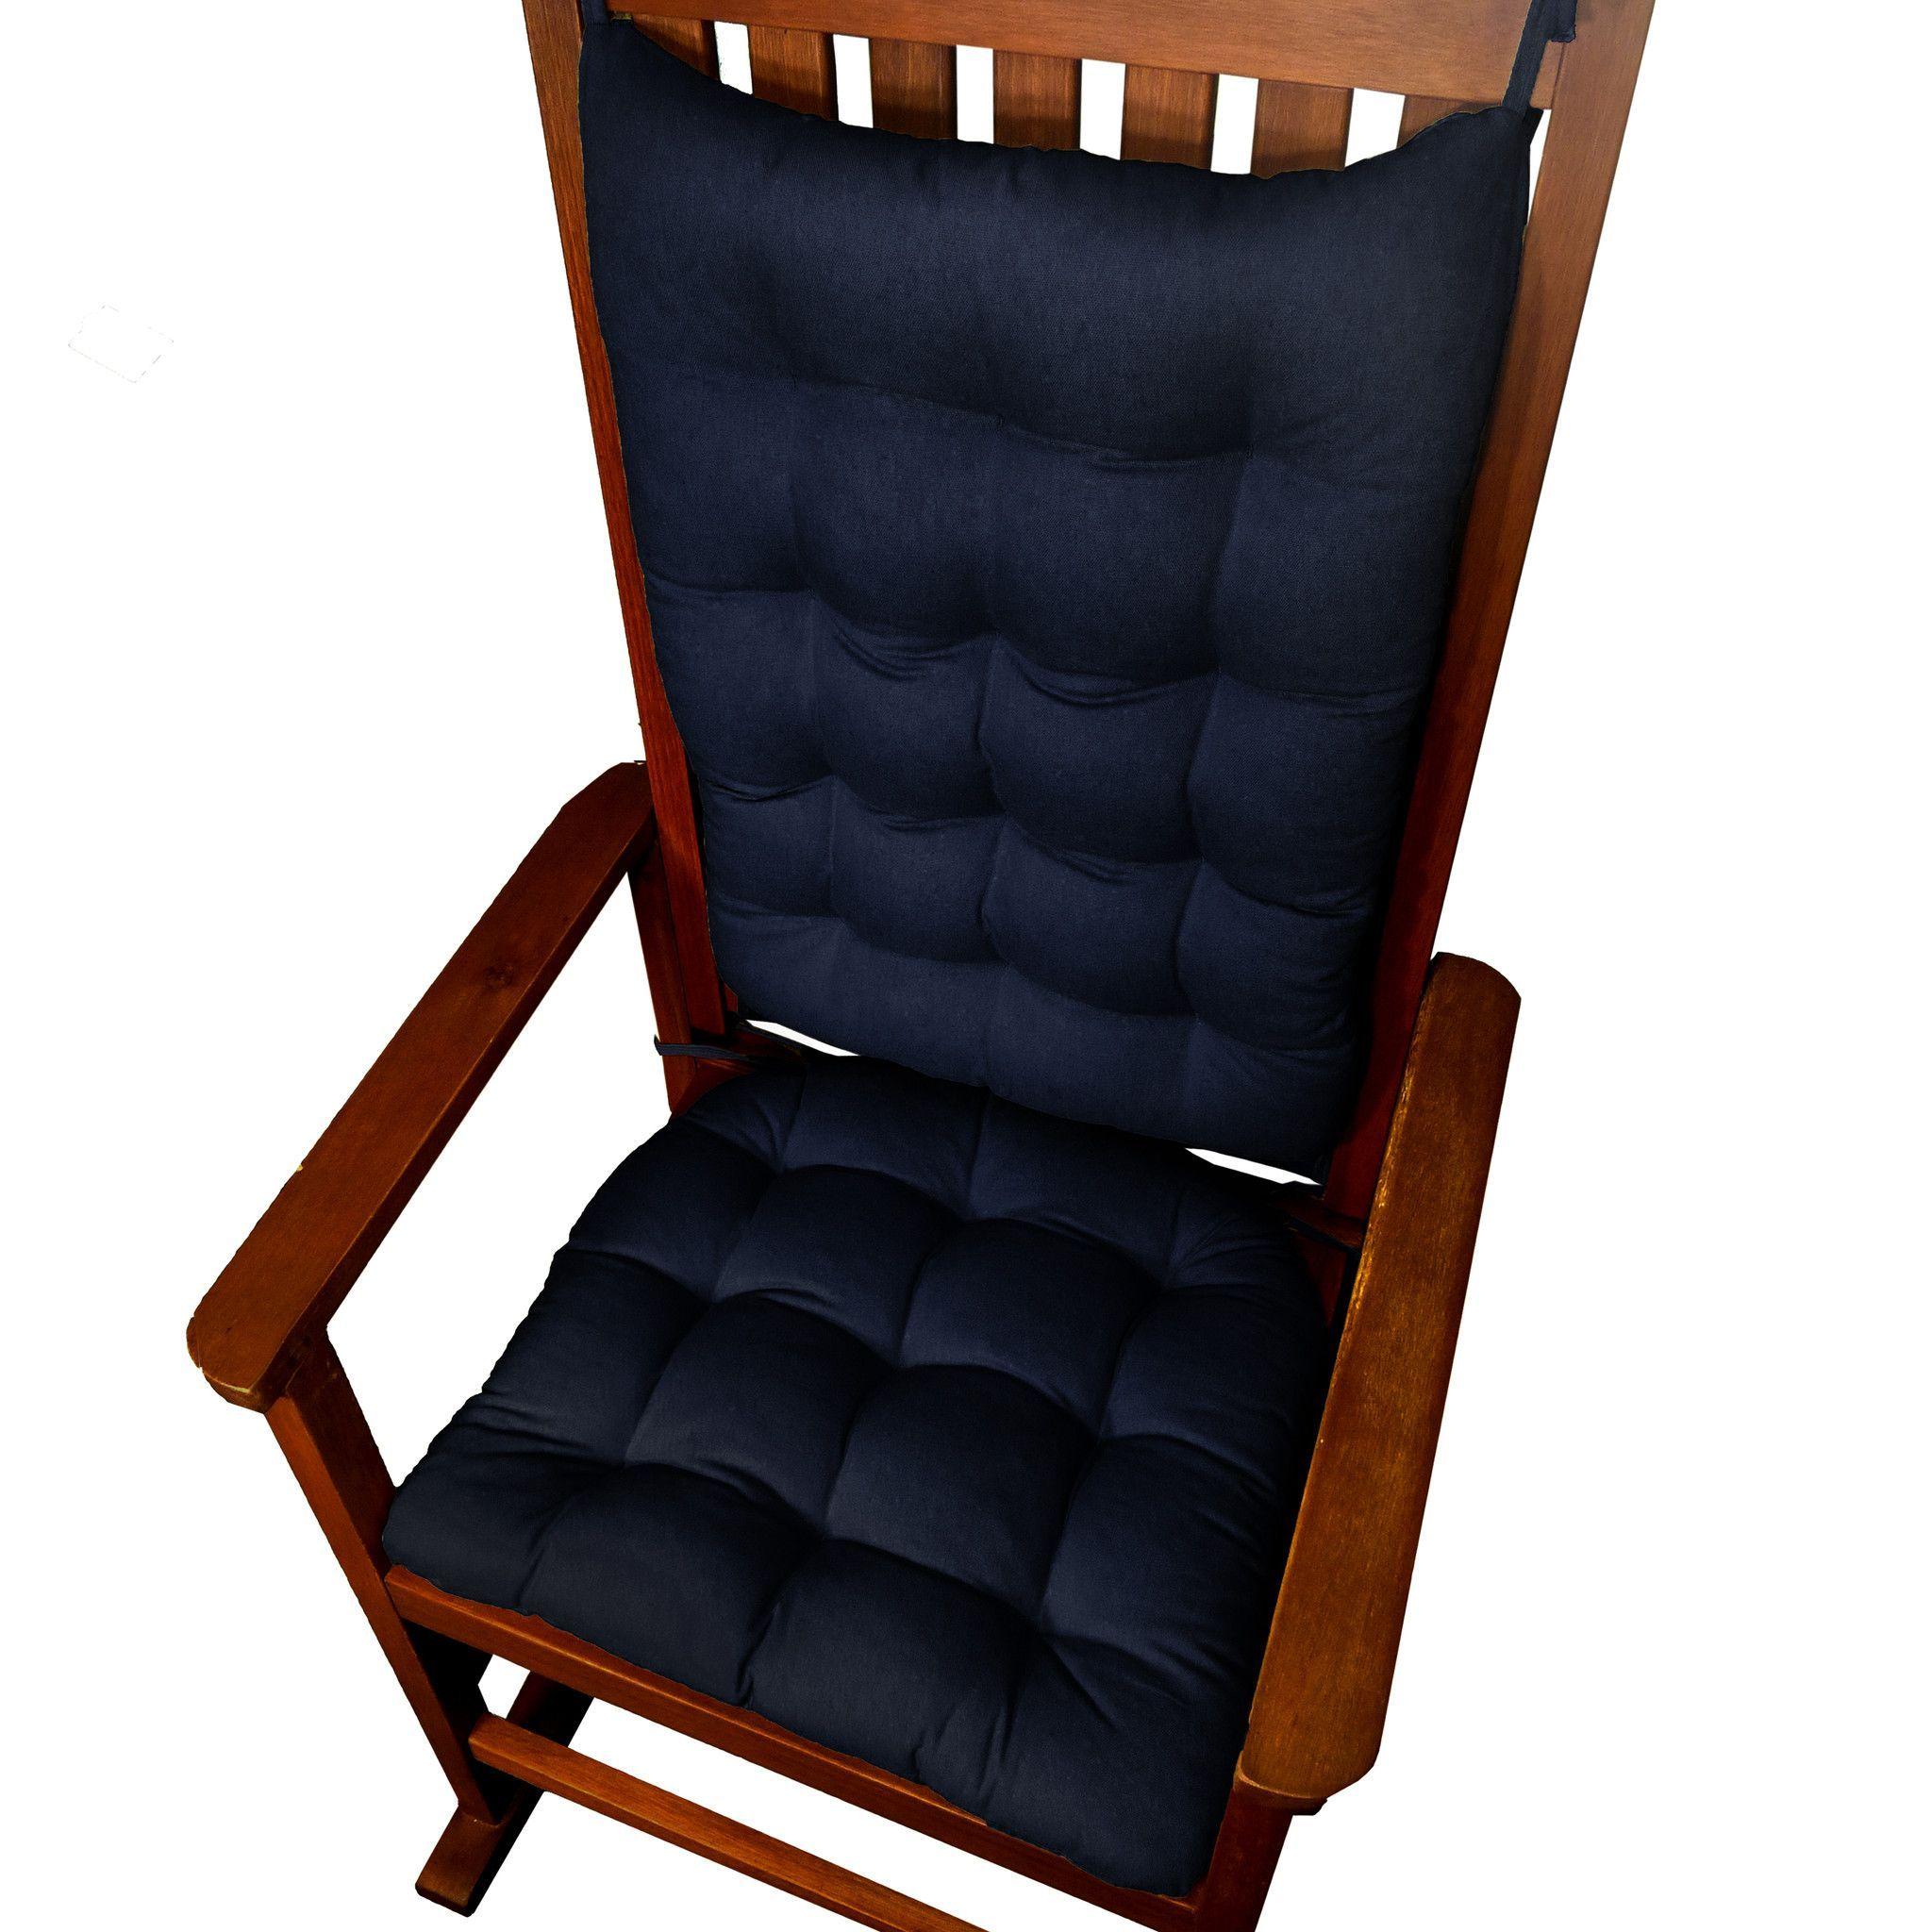 Cotton Duck Navy Blue Rocking Chair Cushions Latex Foam Fill